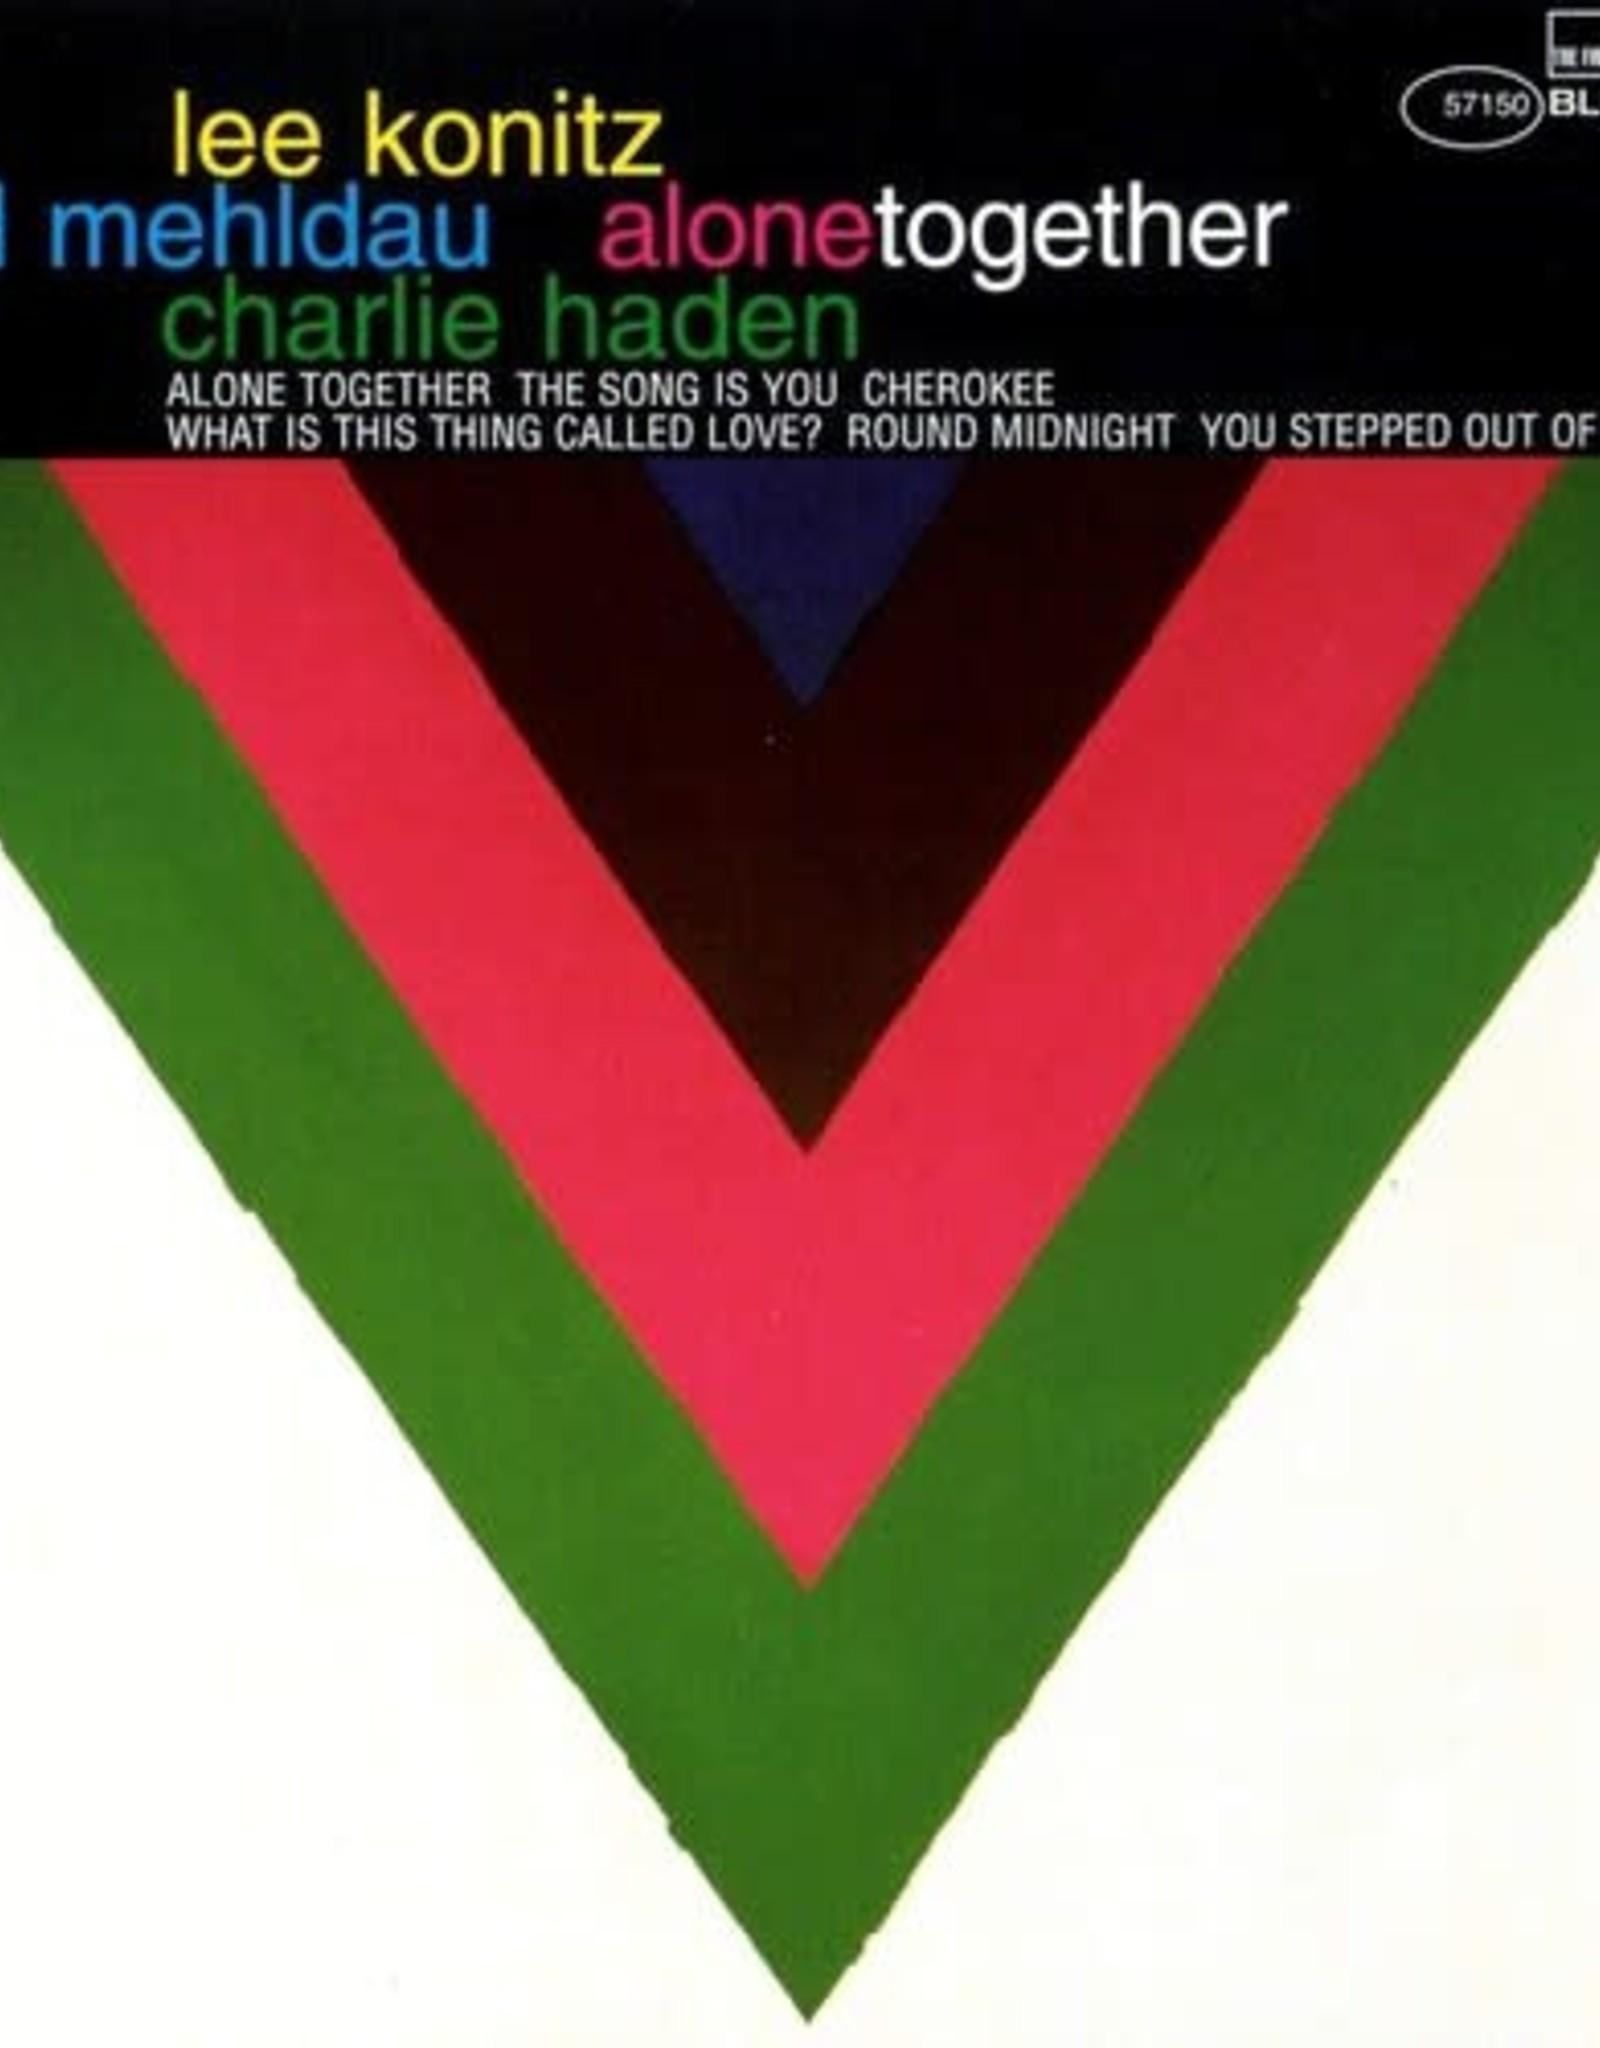 Lee Konitz - Alone Together